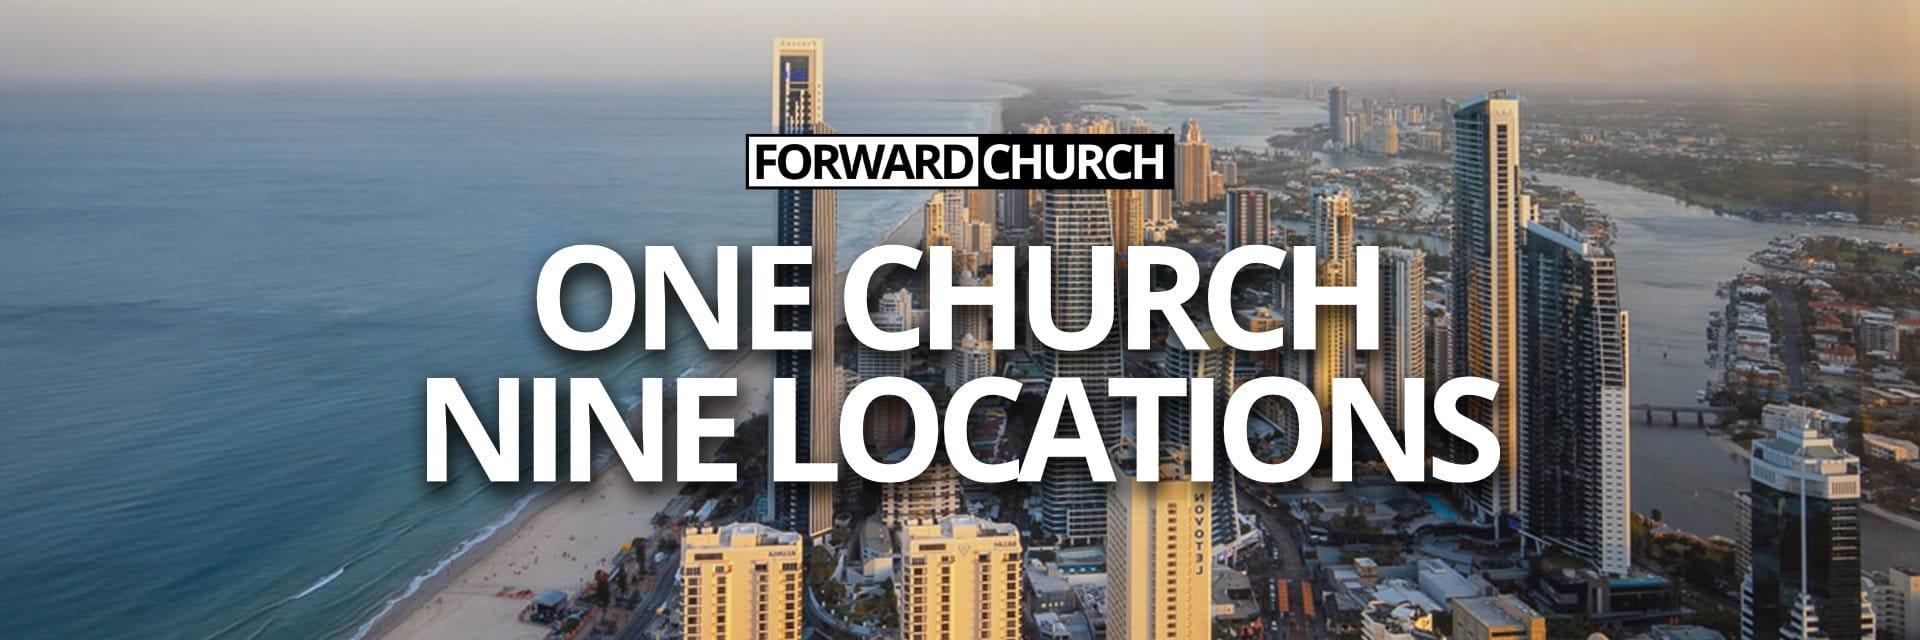 One Church Nine Locations